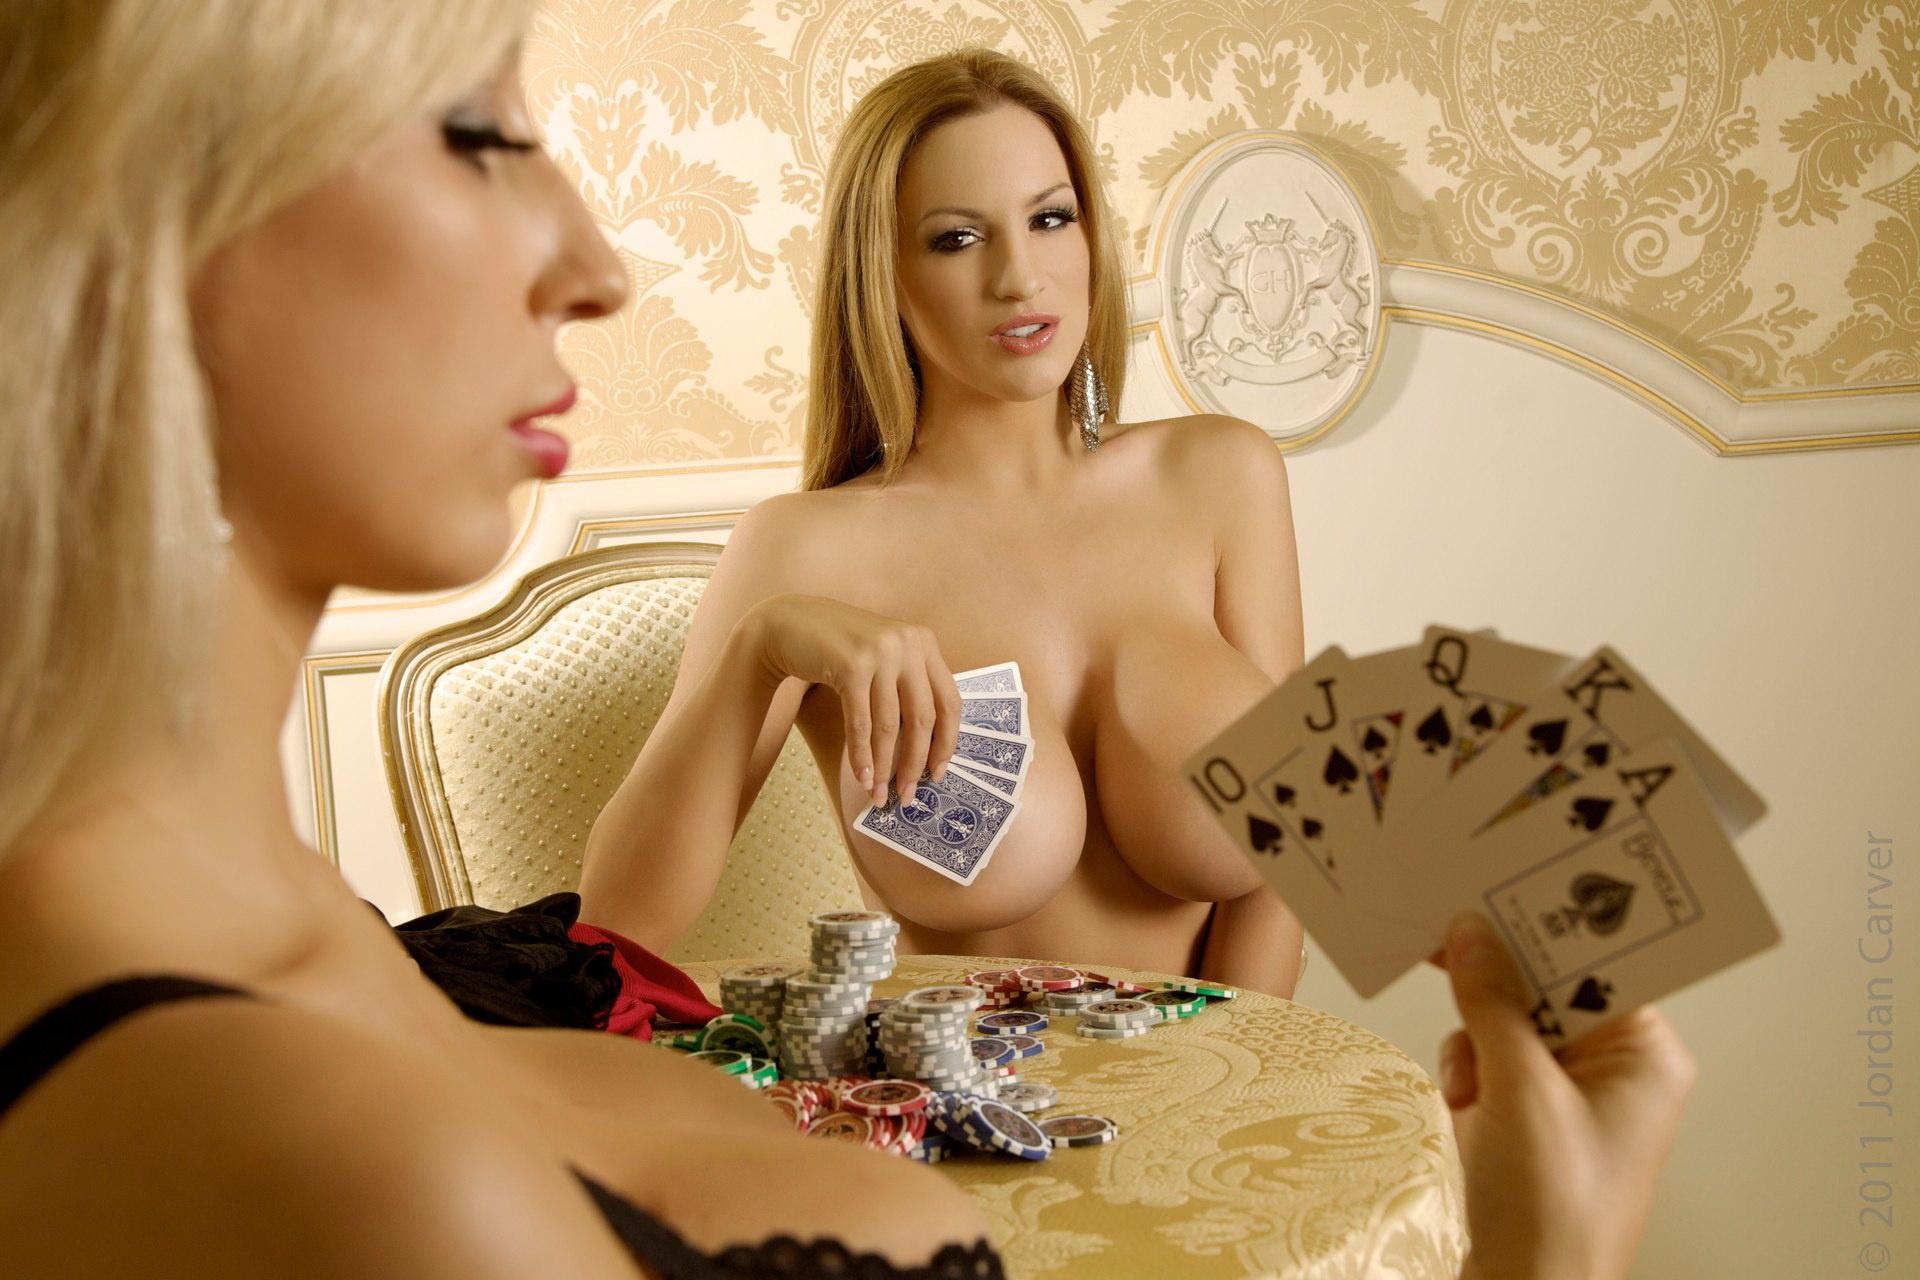 Naked for money, true amateur lesbians